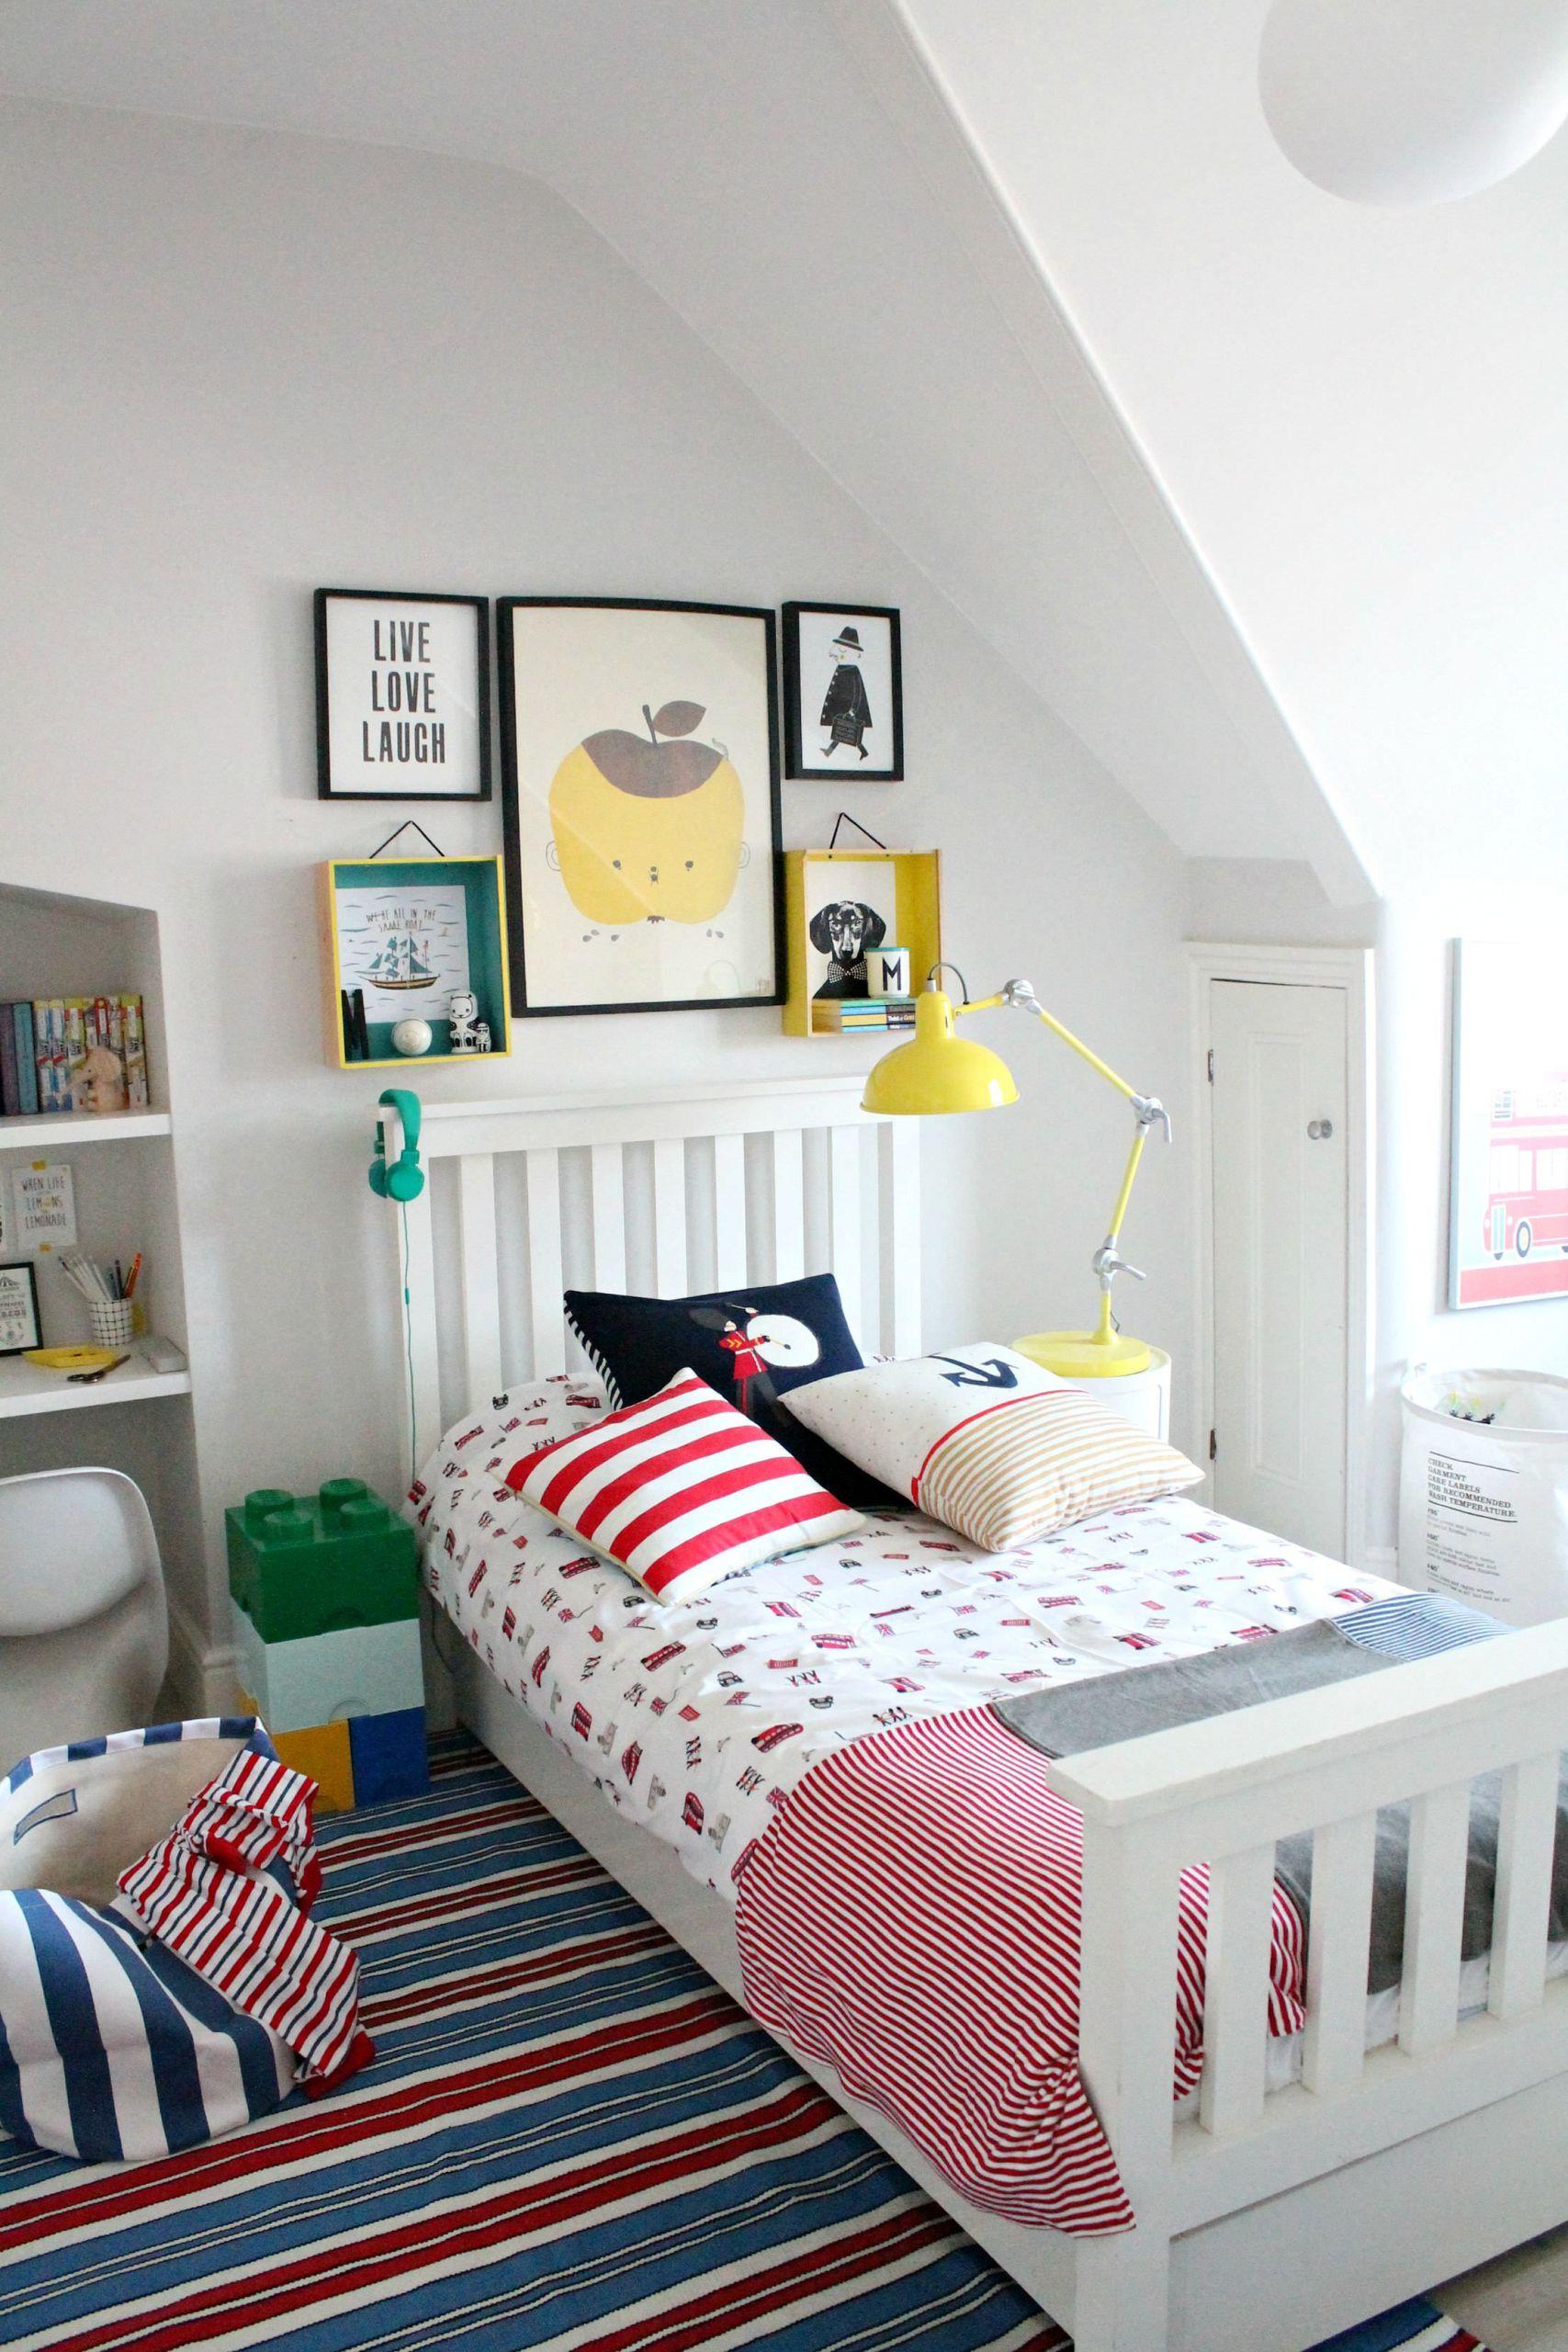 Little Boys Bedroom  littleBIGBELL Boy s bedroom Ideas Decorating with a rug